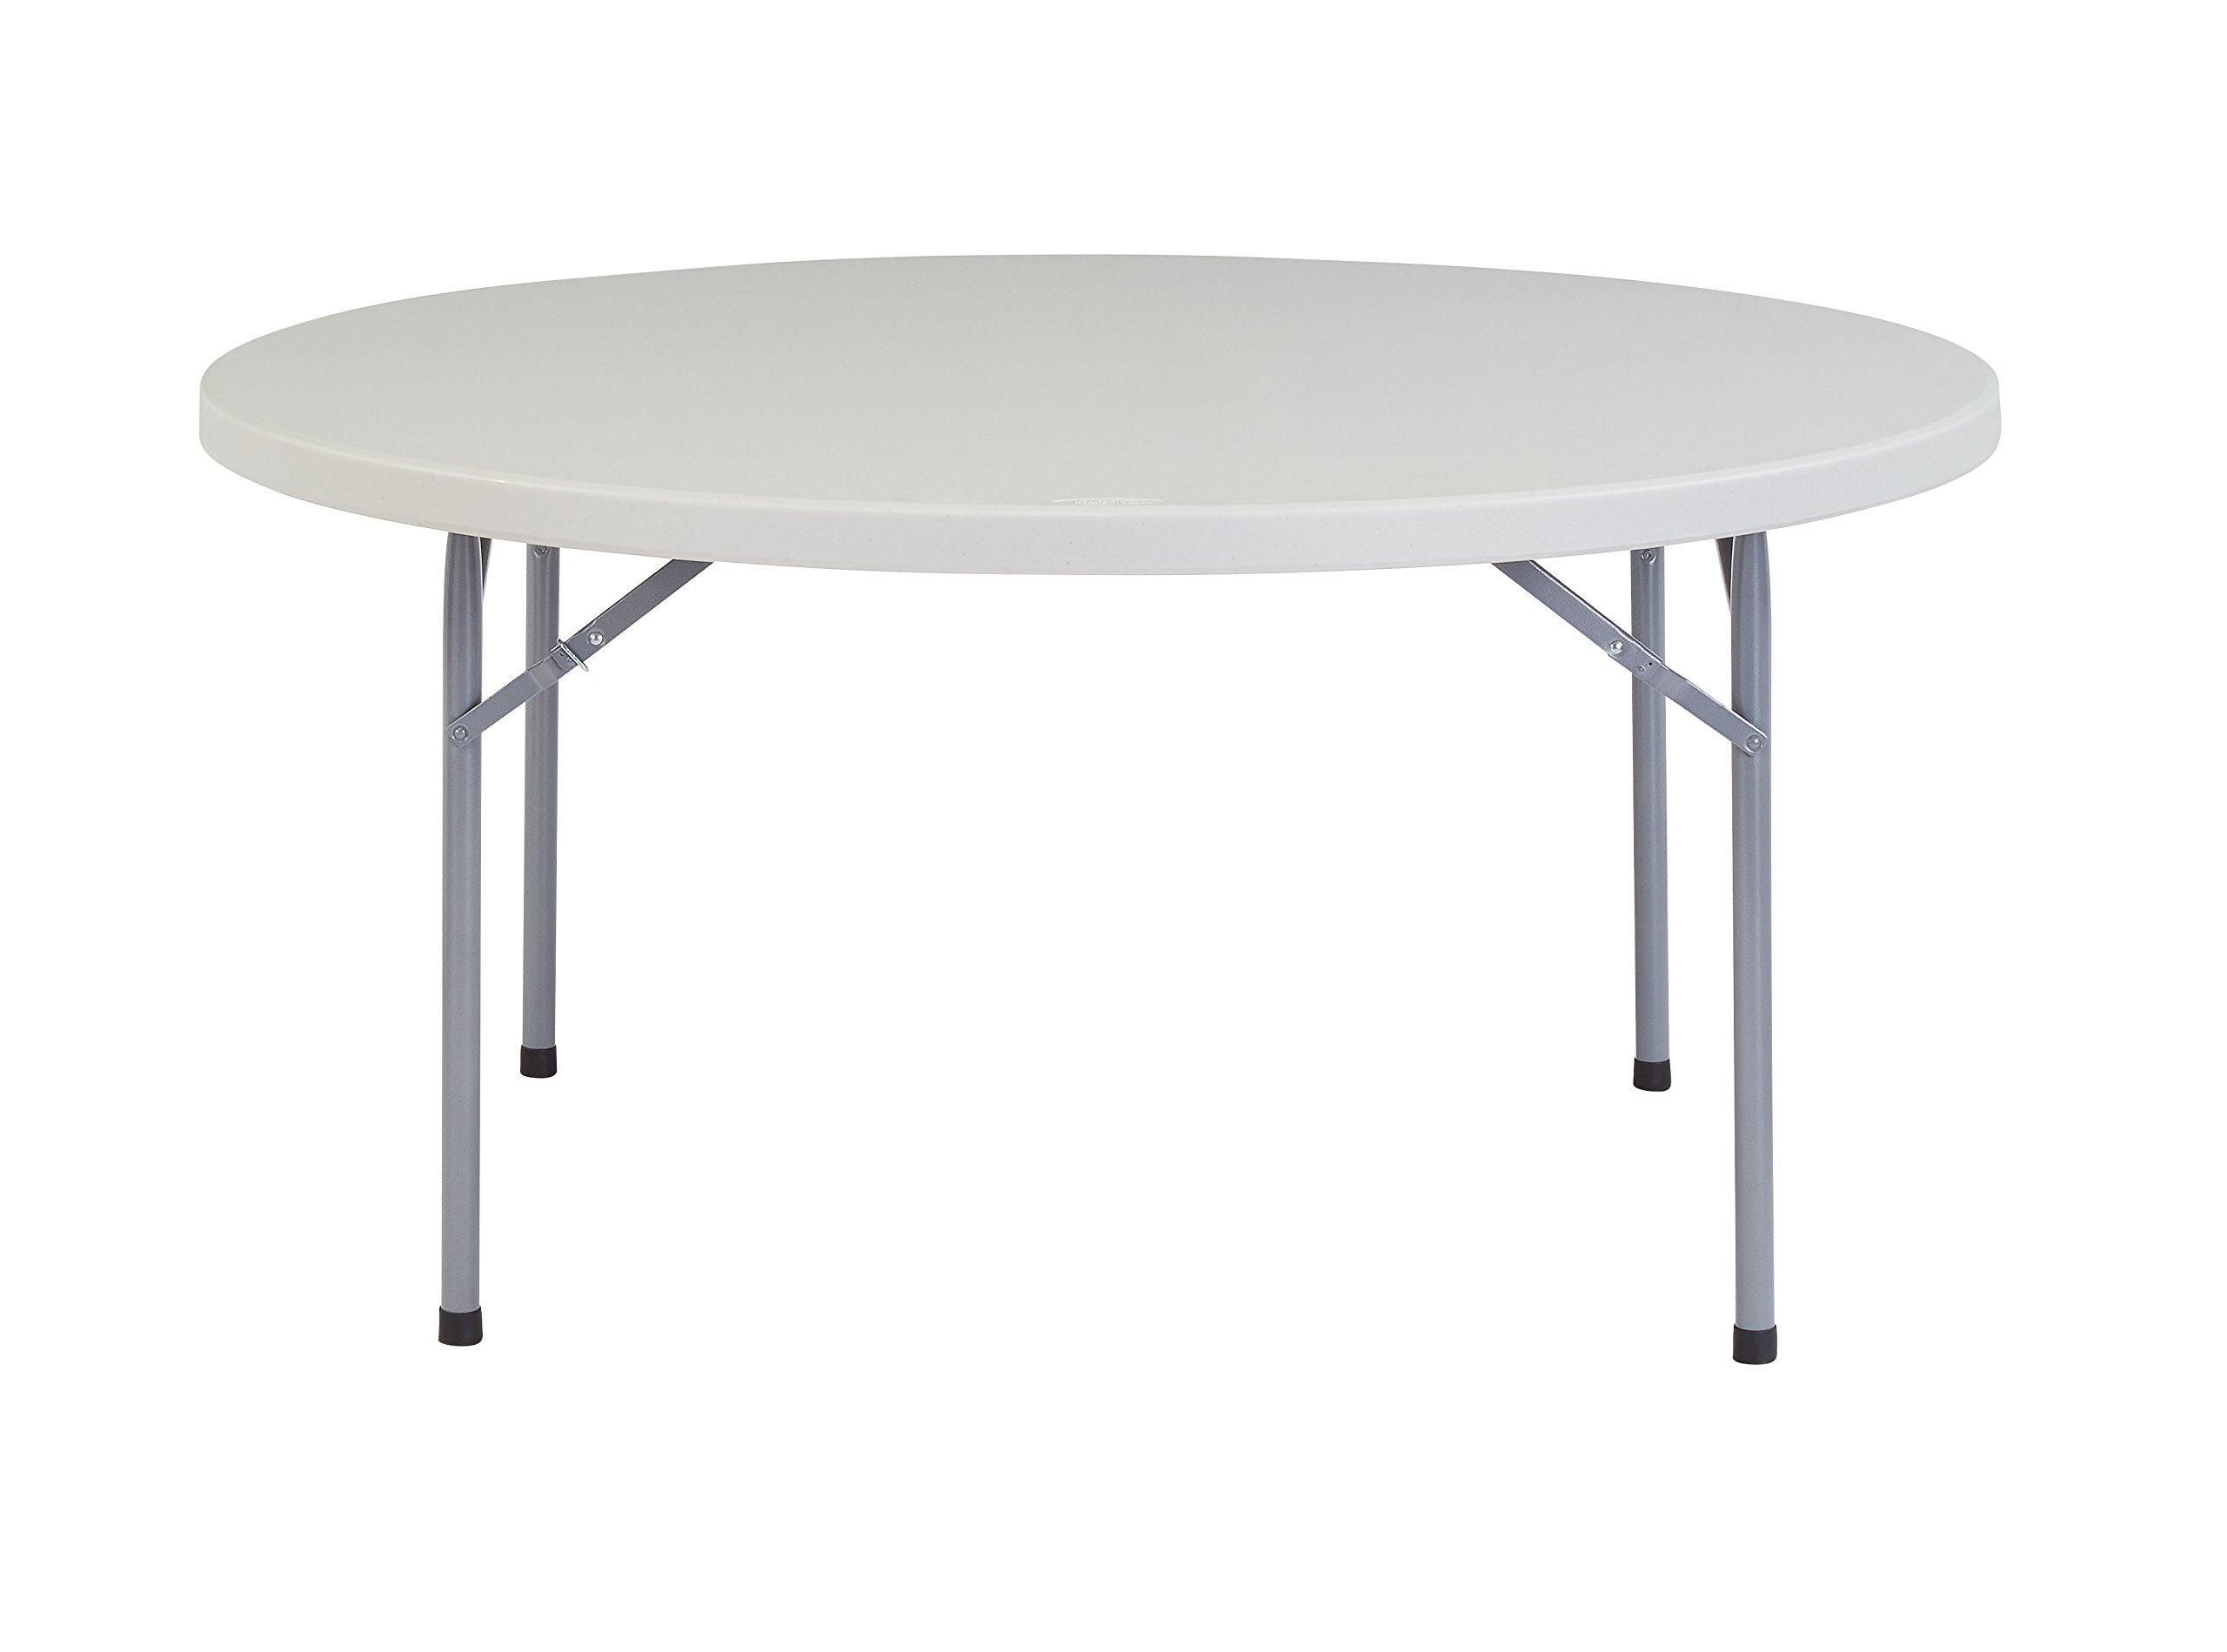 "Round Folding Table, 60""Dia. 29-1/2""H, Light"